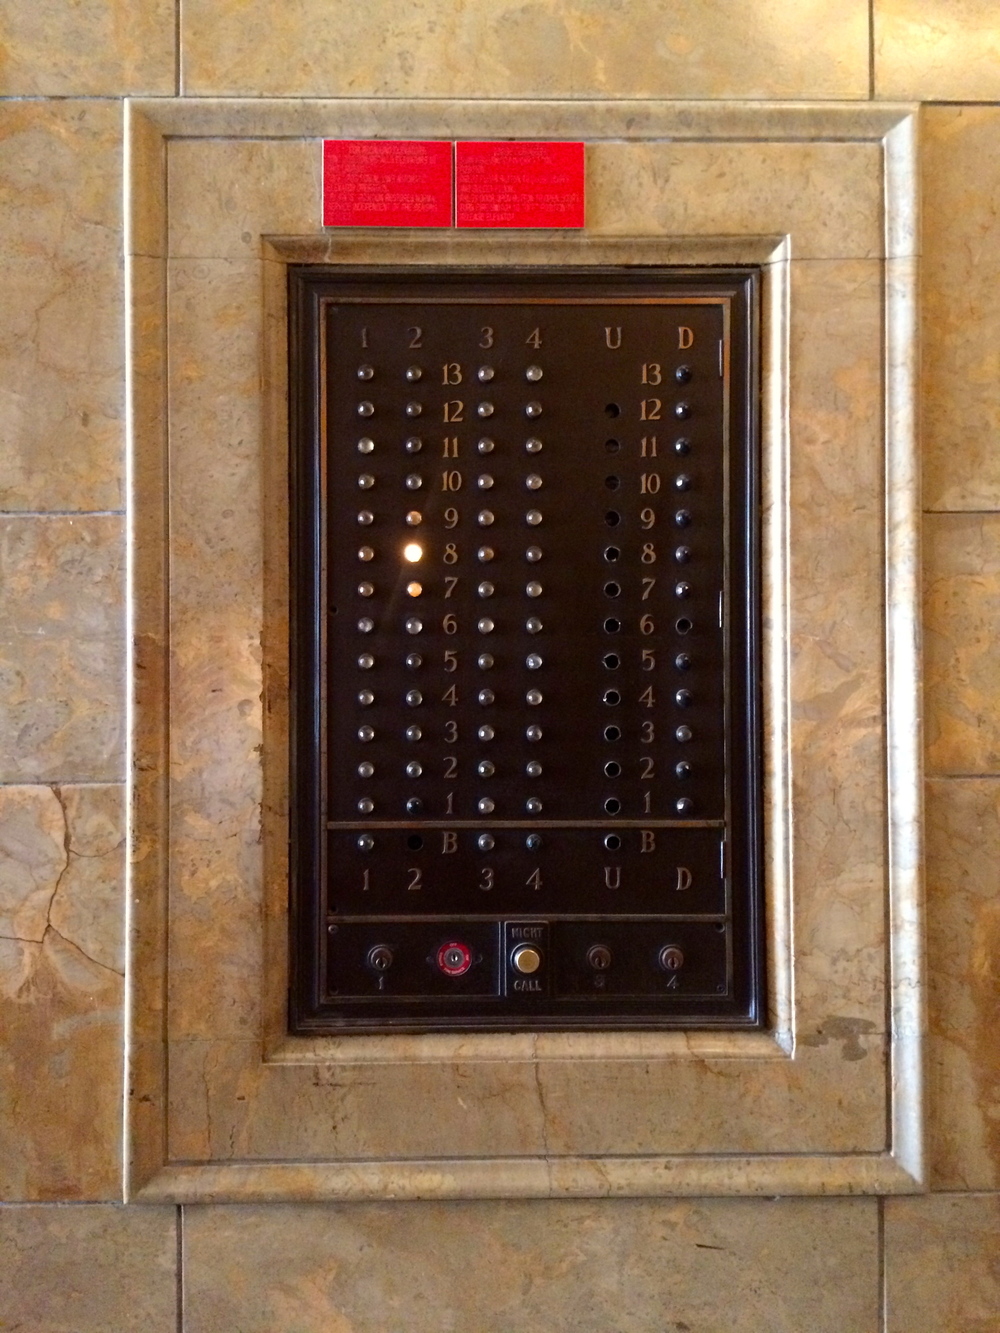 perch_elevator.jpg